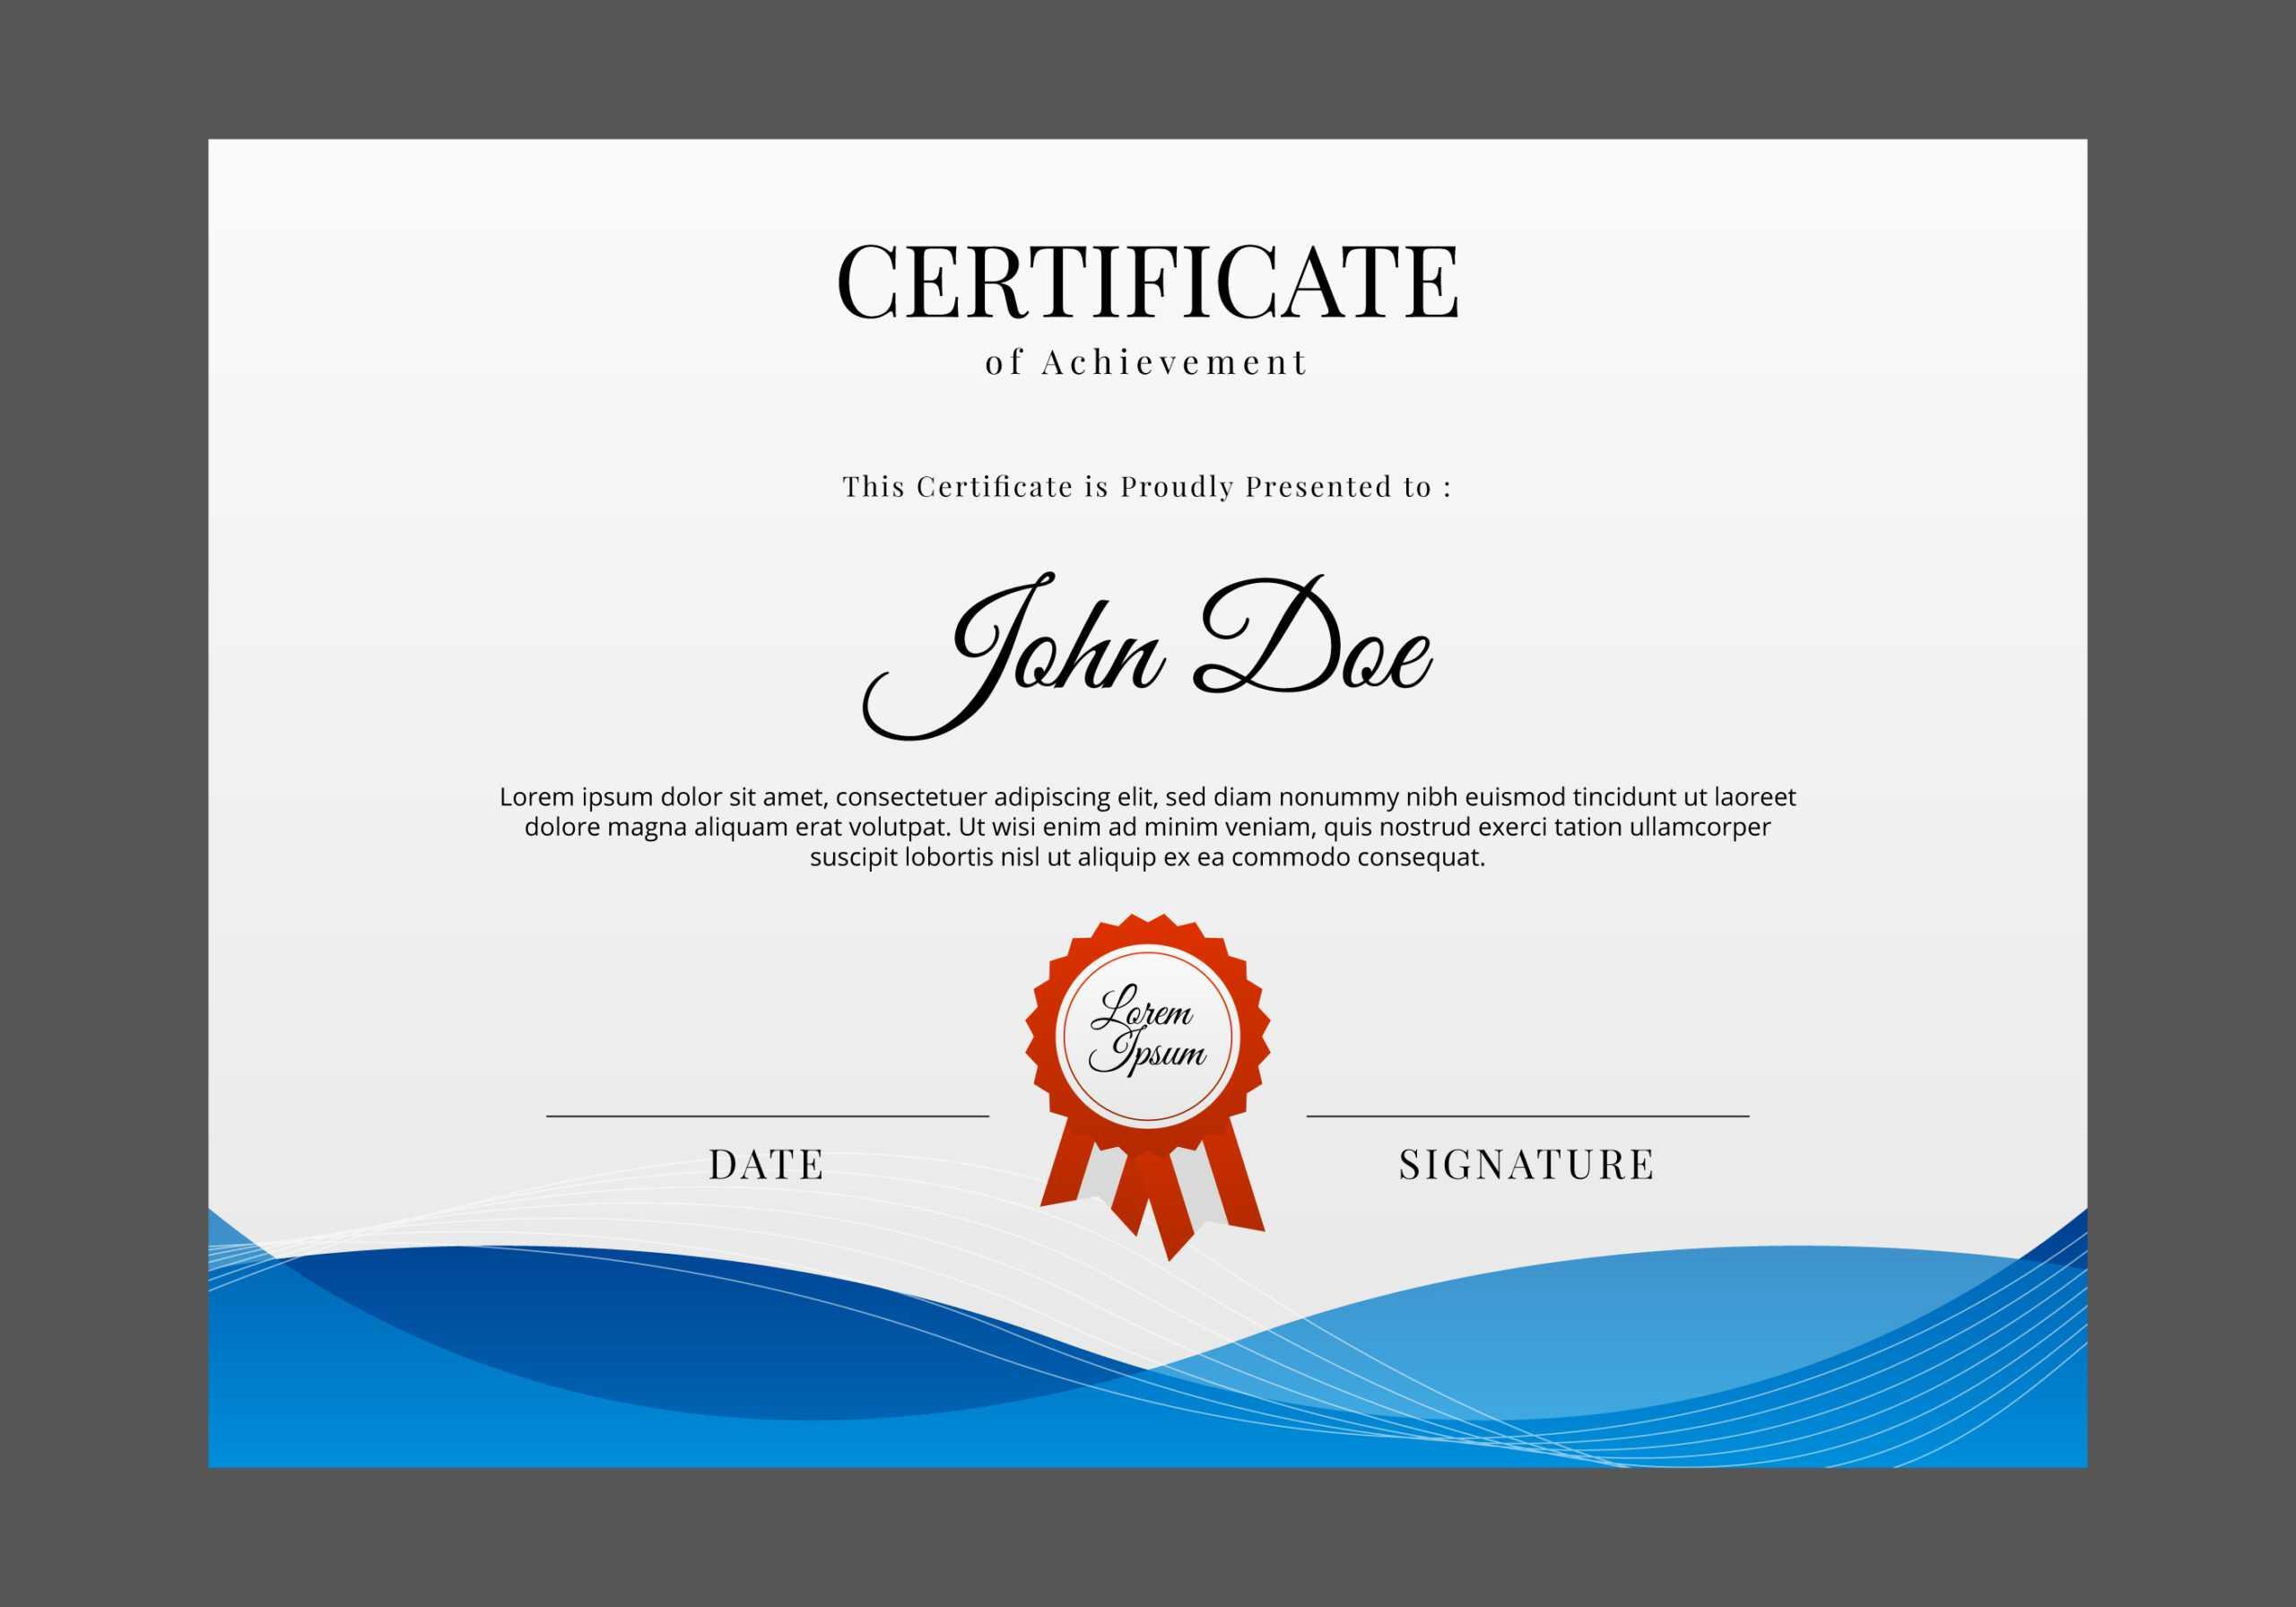 Certificate Templates, Free Certificate Designs For Design A Certificate Template